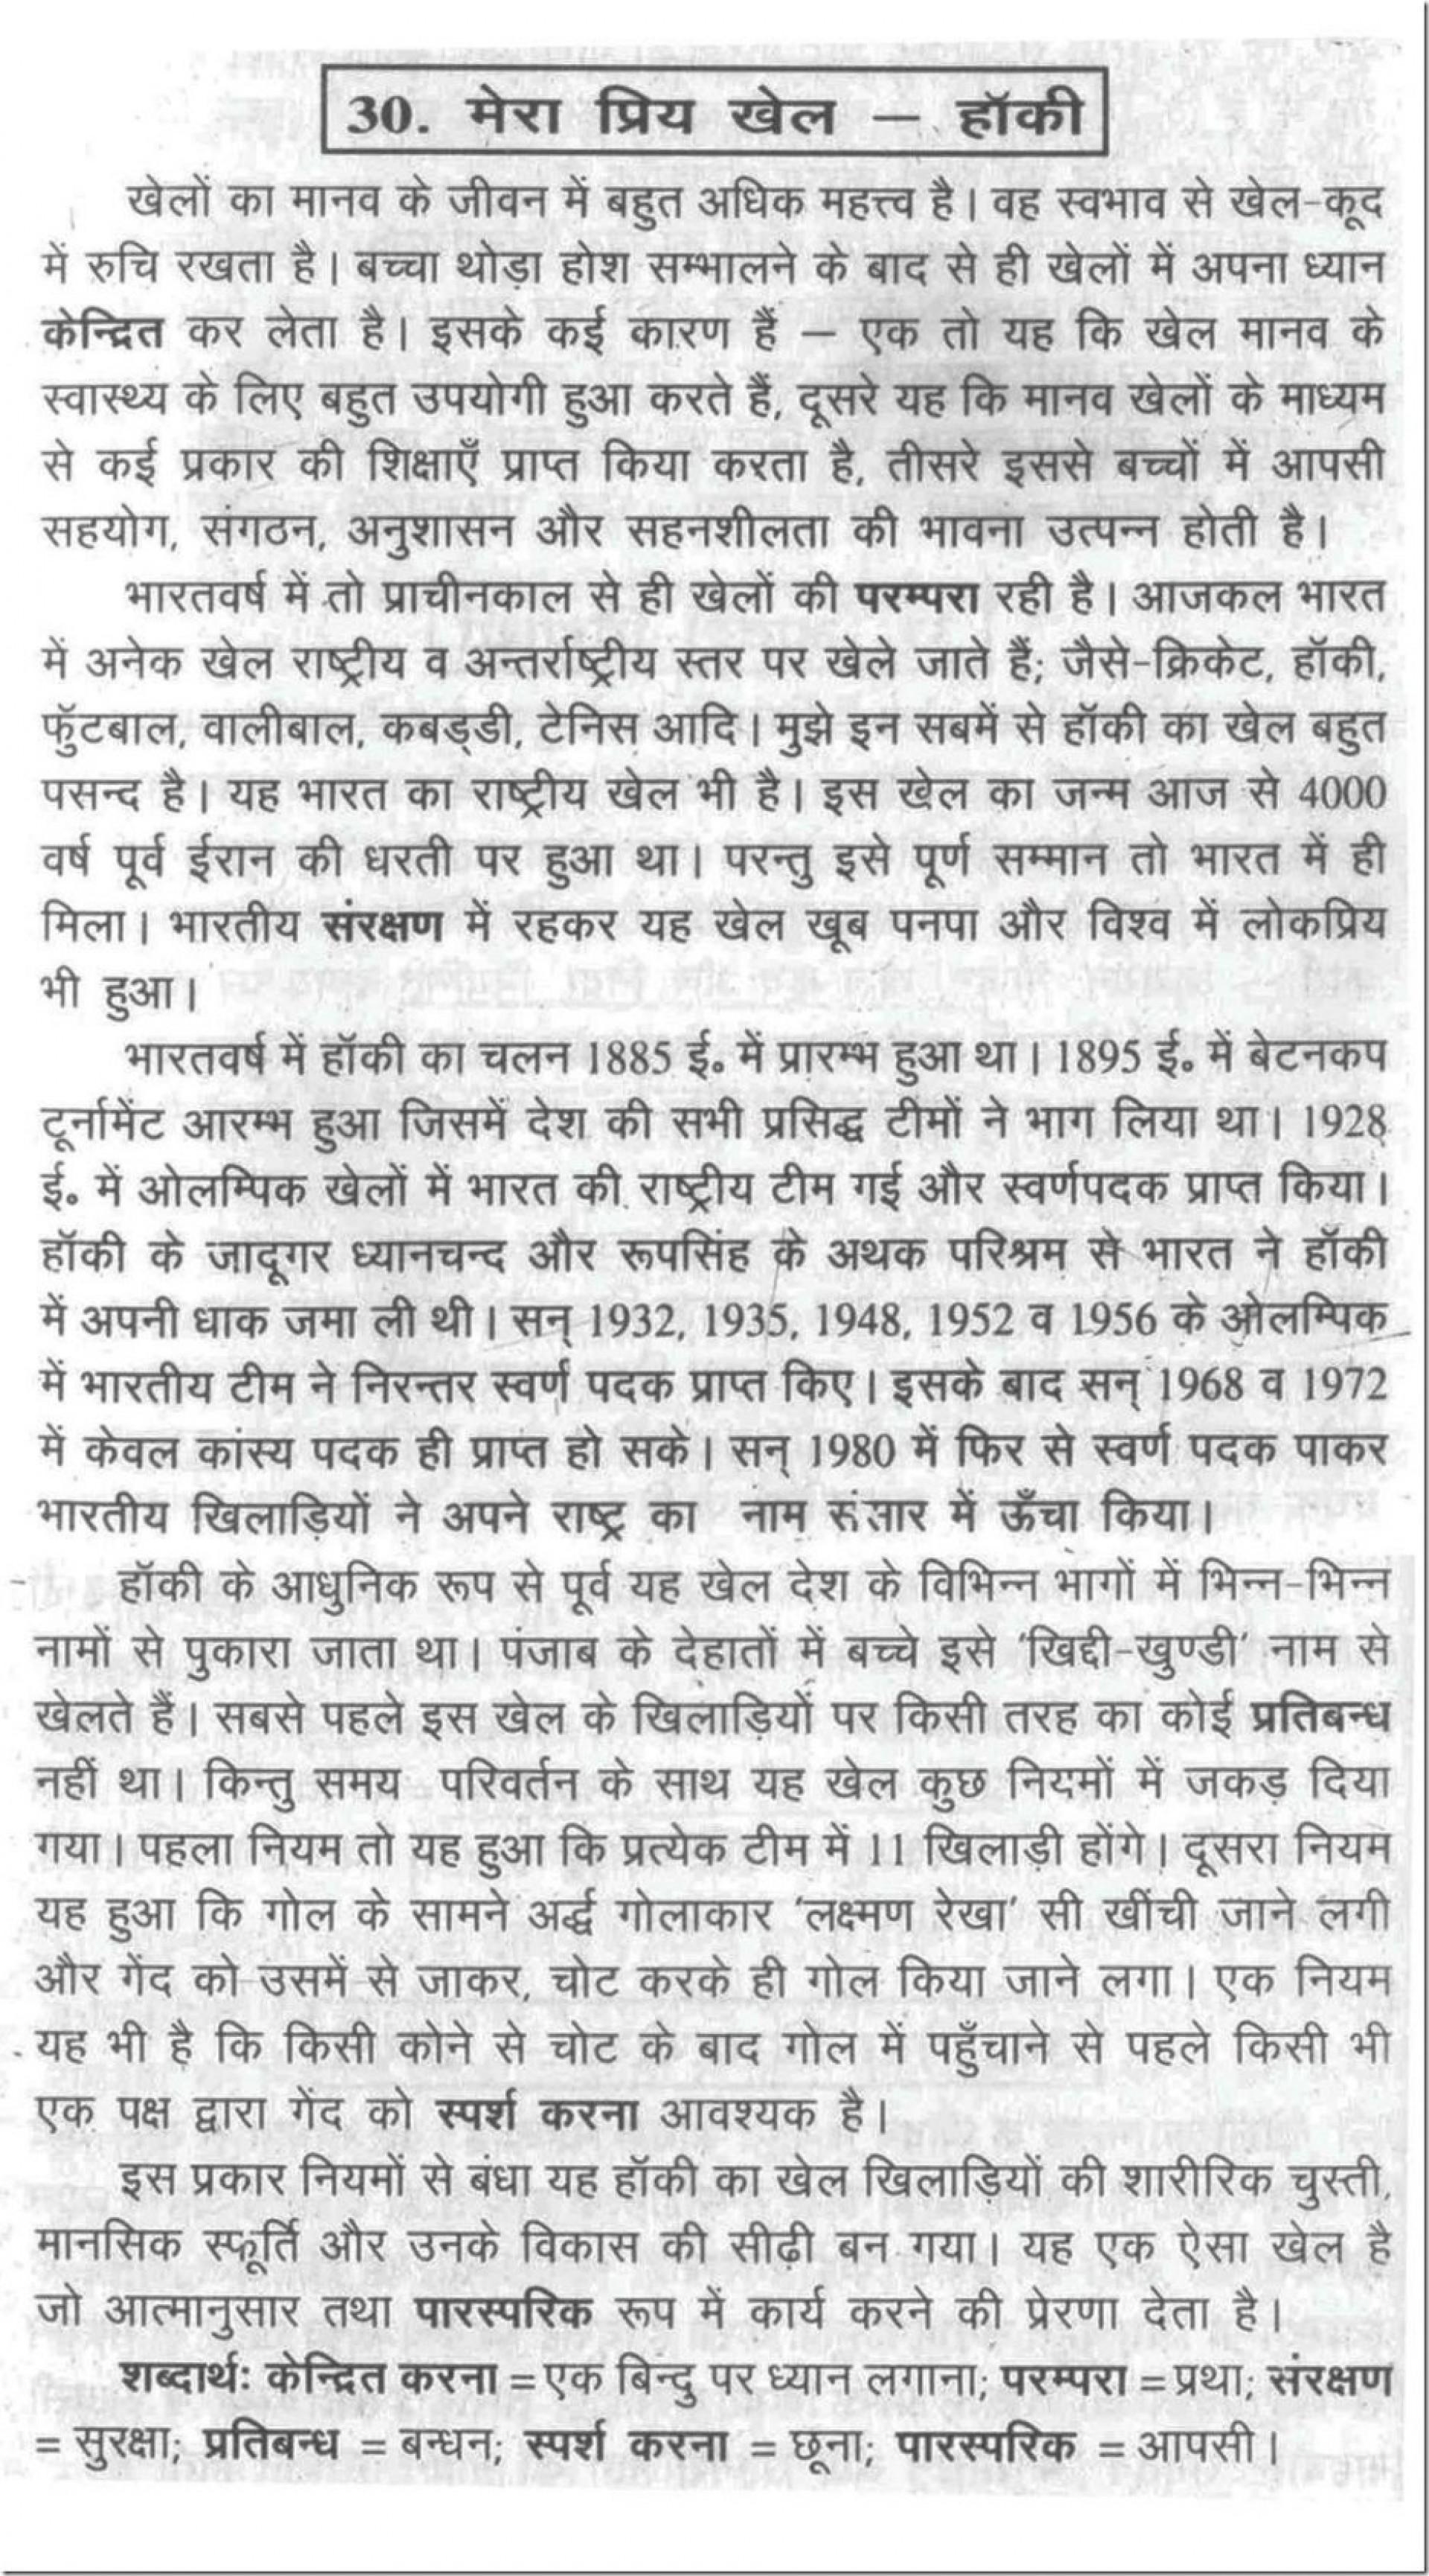 007 Favorite Sport Essay Thumb My In Hindi Basketball Football Cricket Badminton On About Skiing Soccer Sample Swimming For Kids Free Ielts 936x1687 Imposing Sportsman Virat Kohli Volleyball 1920